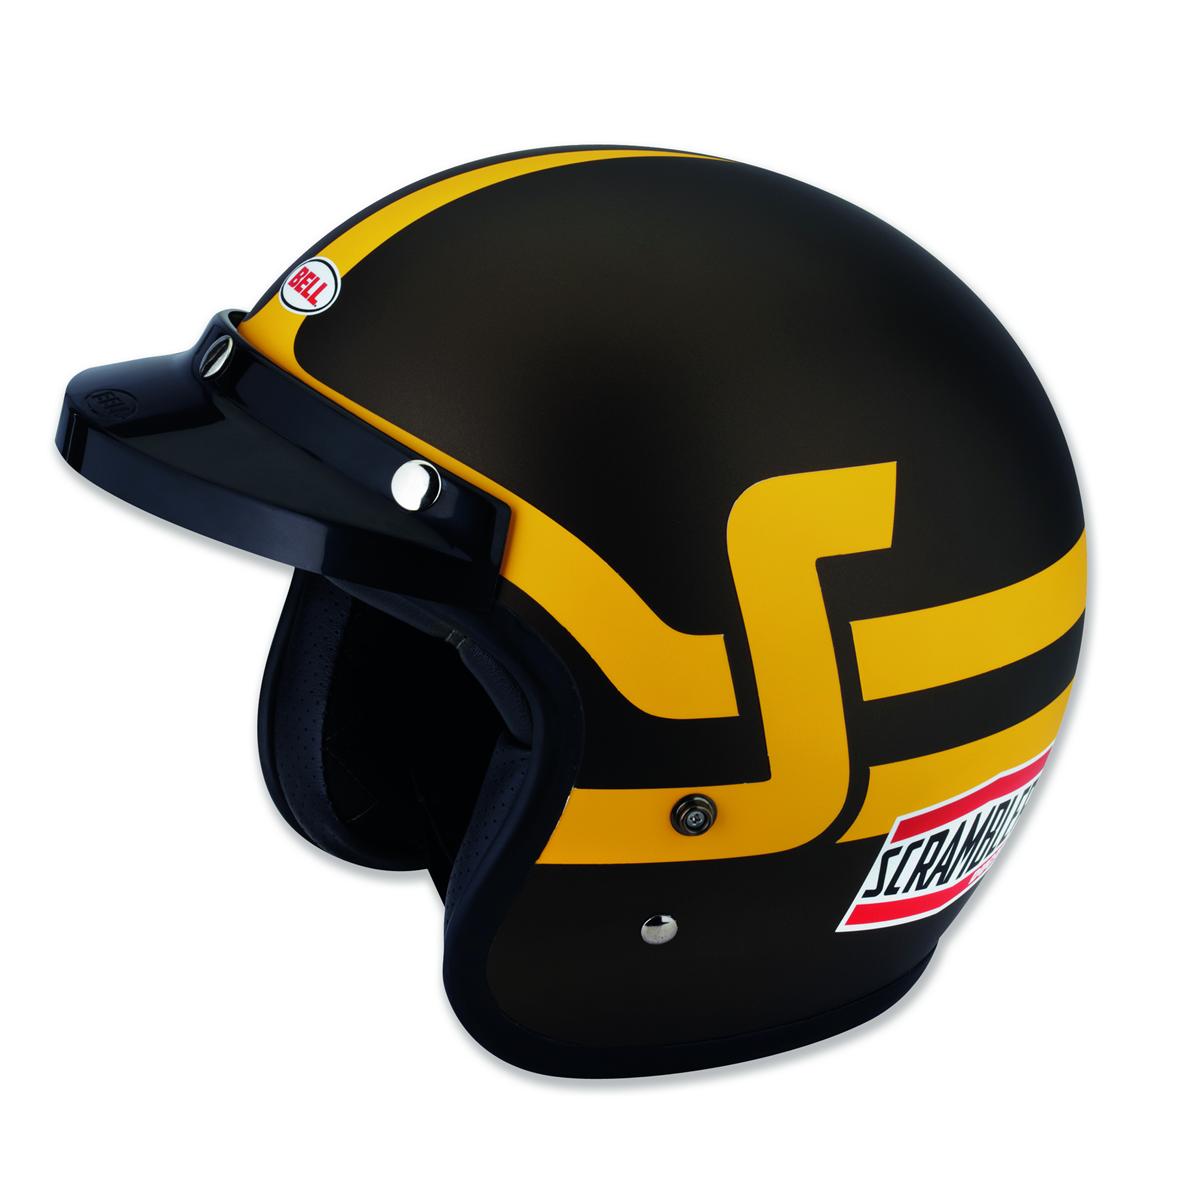 casque jet ducati scrambler short track s team motos. Black Bedroom Furniture Sets. Home Design Ideas